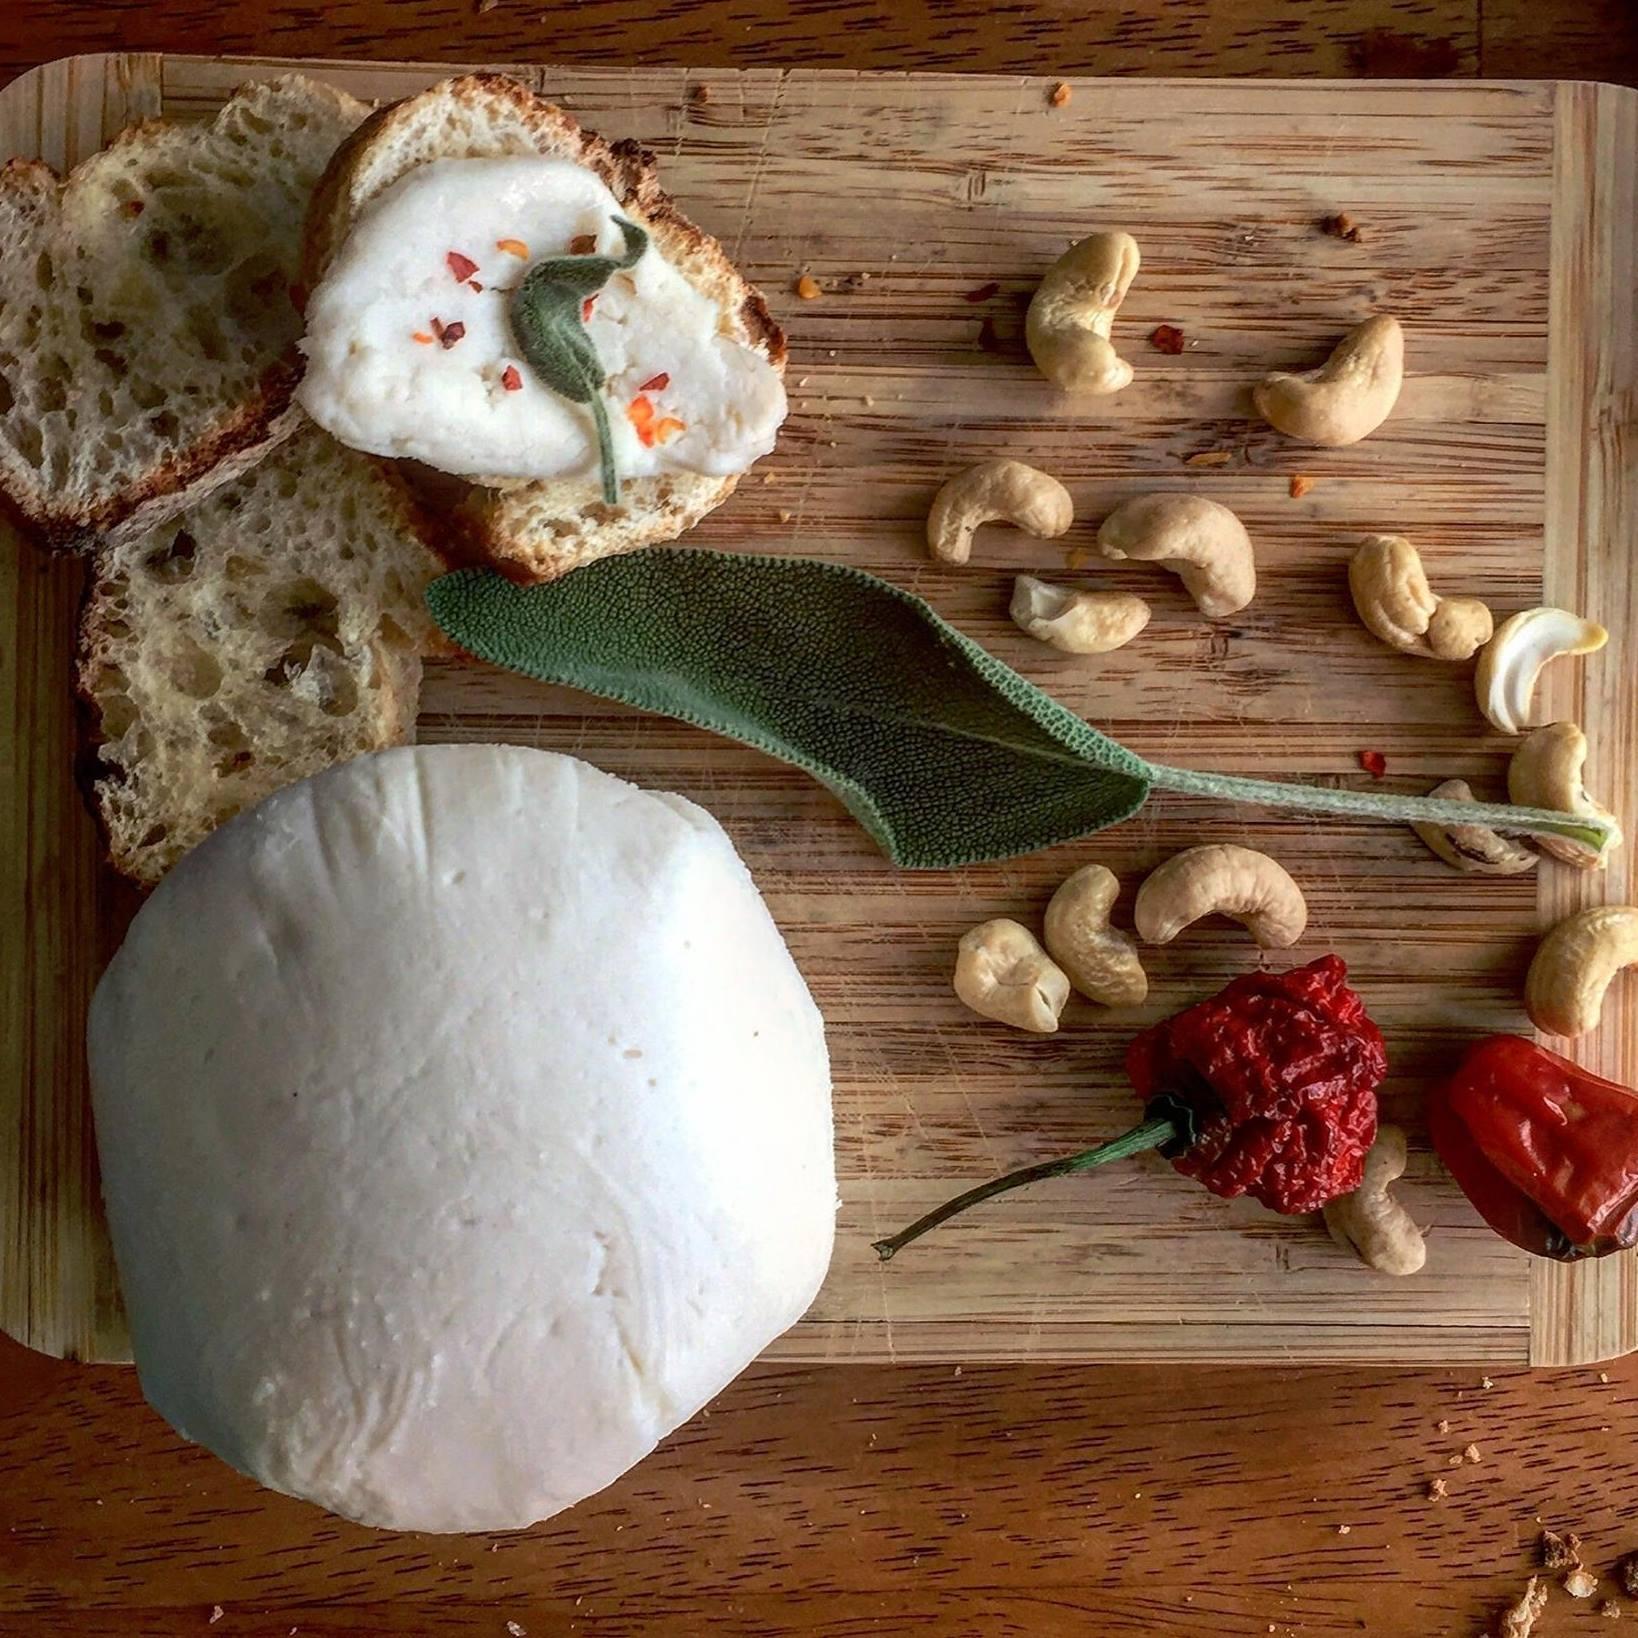 UNMOO, Richmond  Cultured vegan cheeses